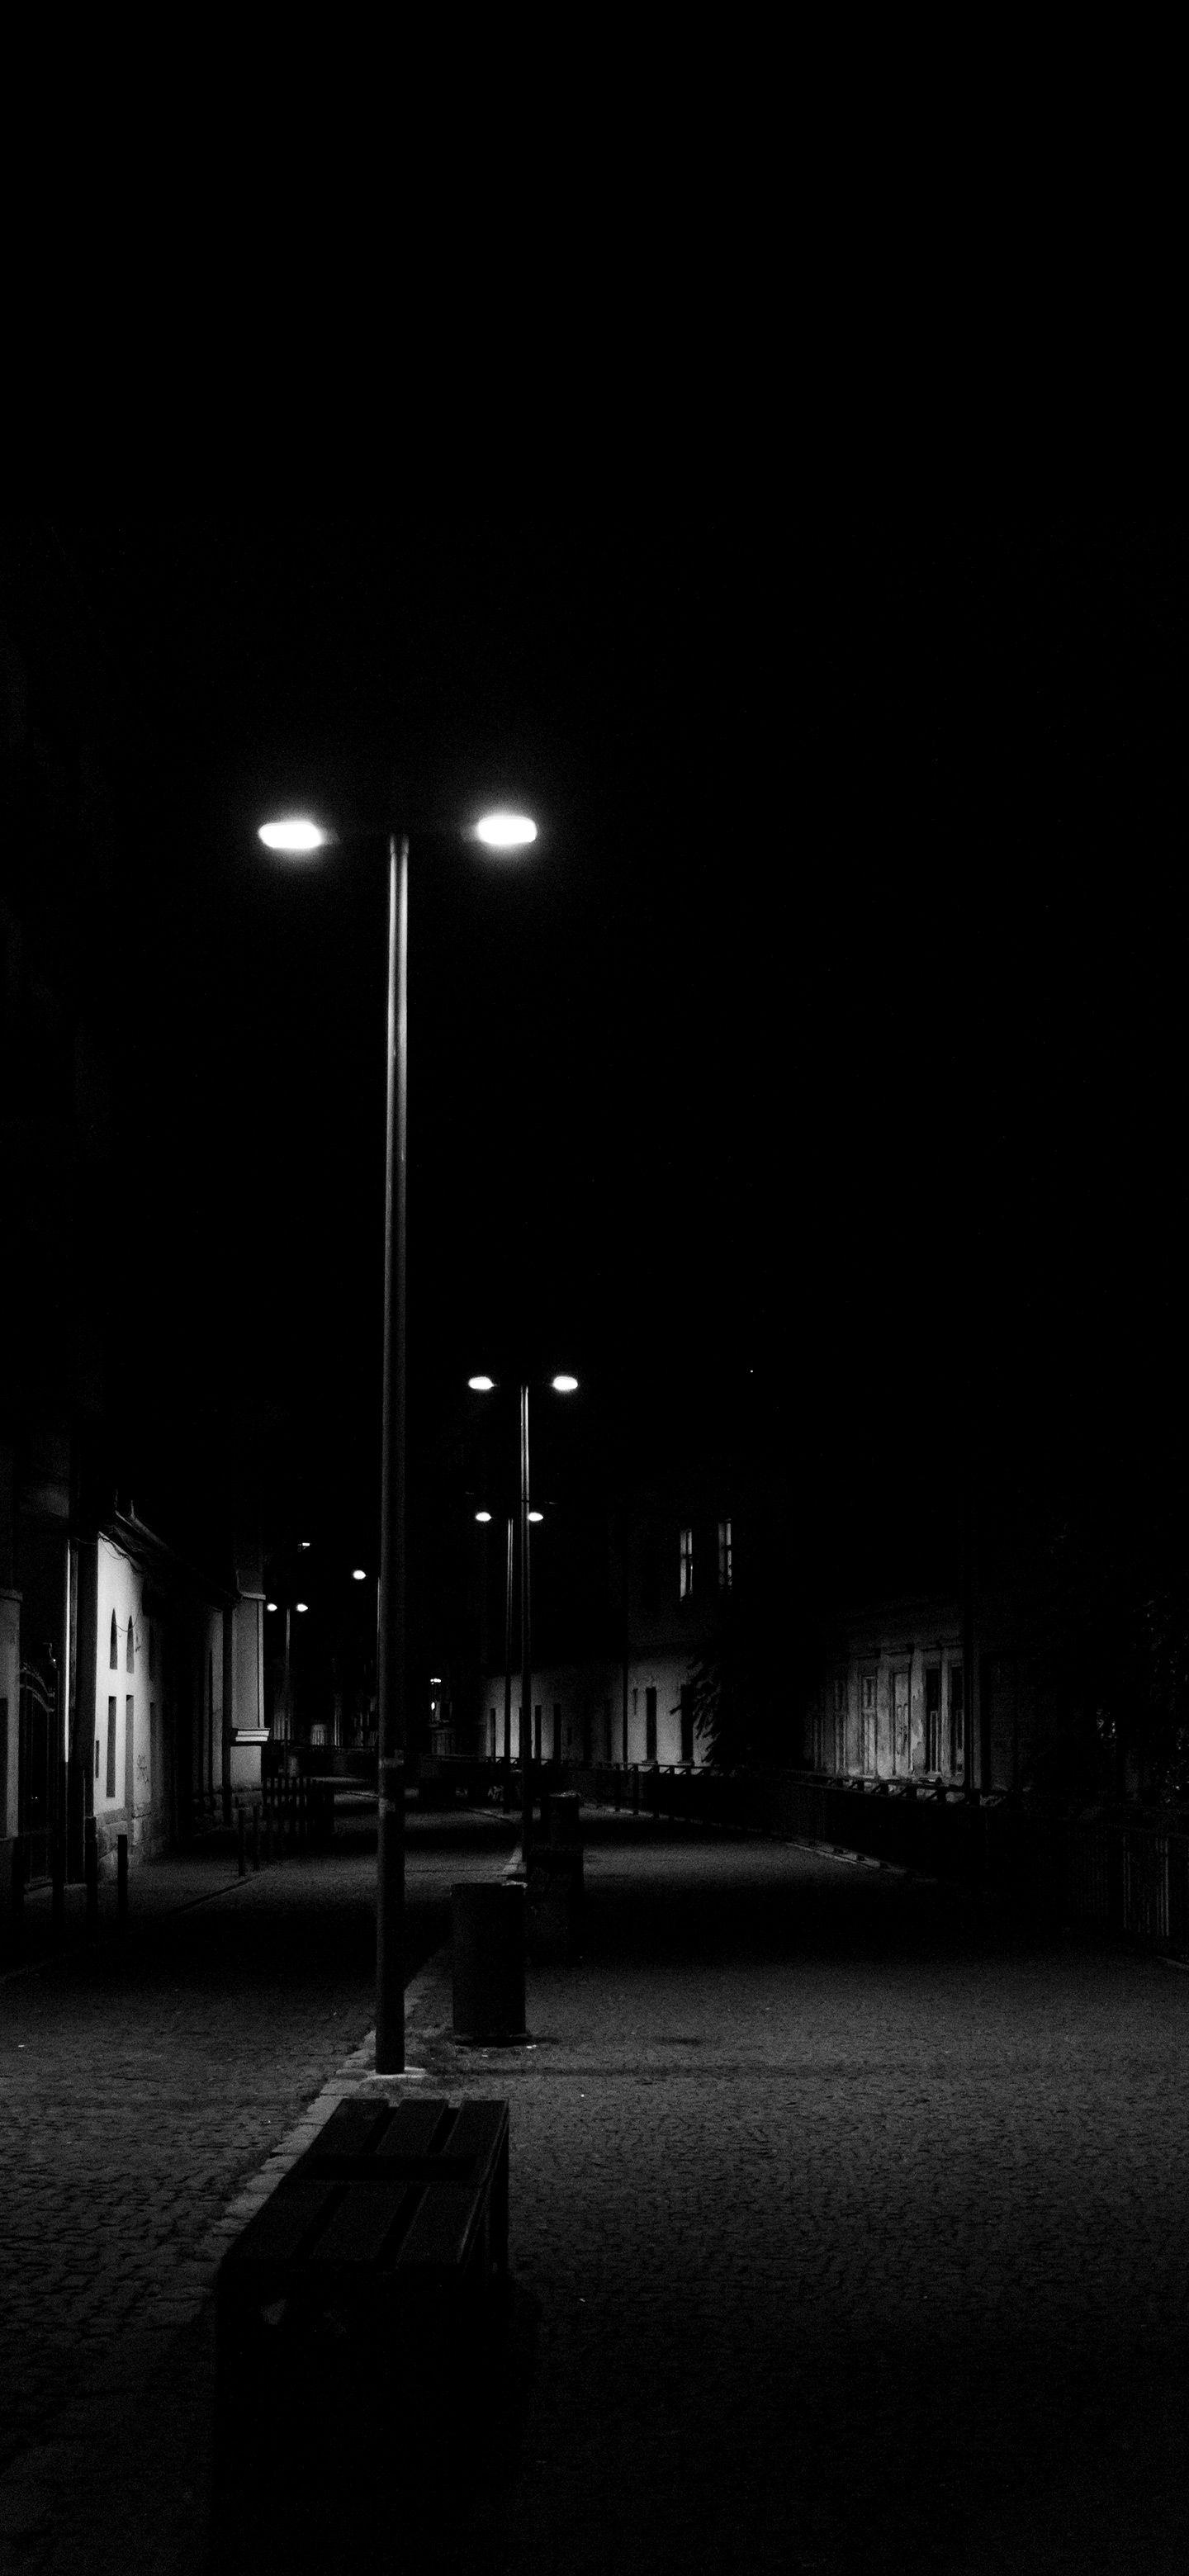 Empty Street Dark Street Dark Wallpaper Wallpaper